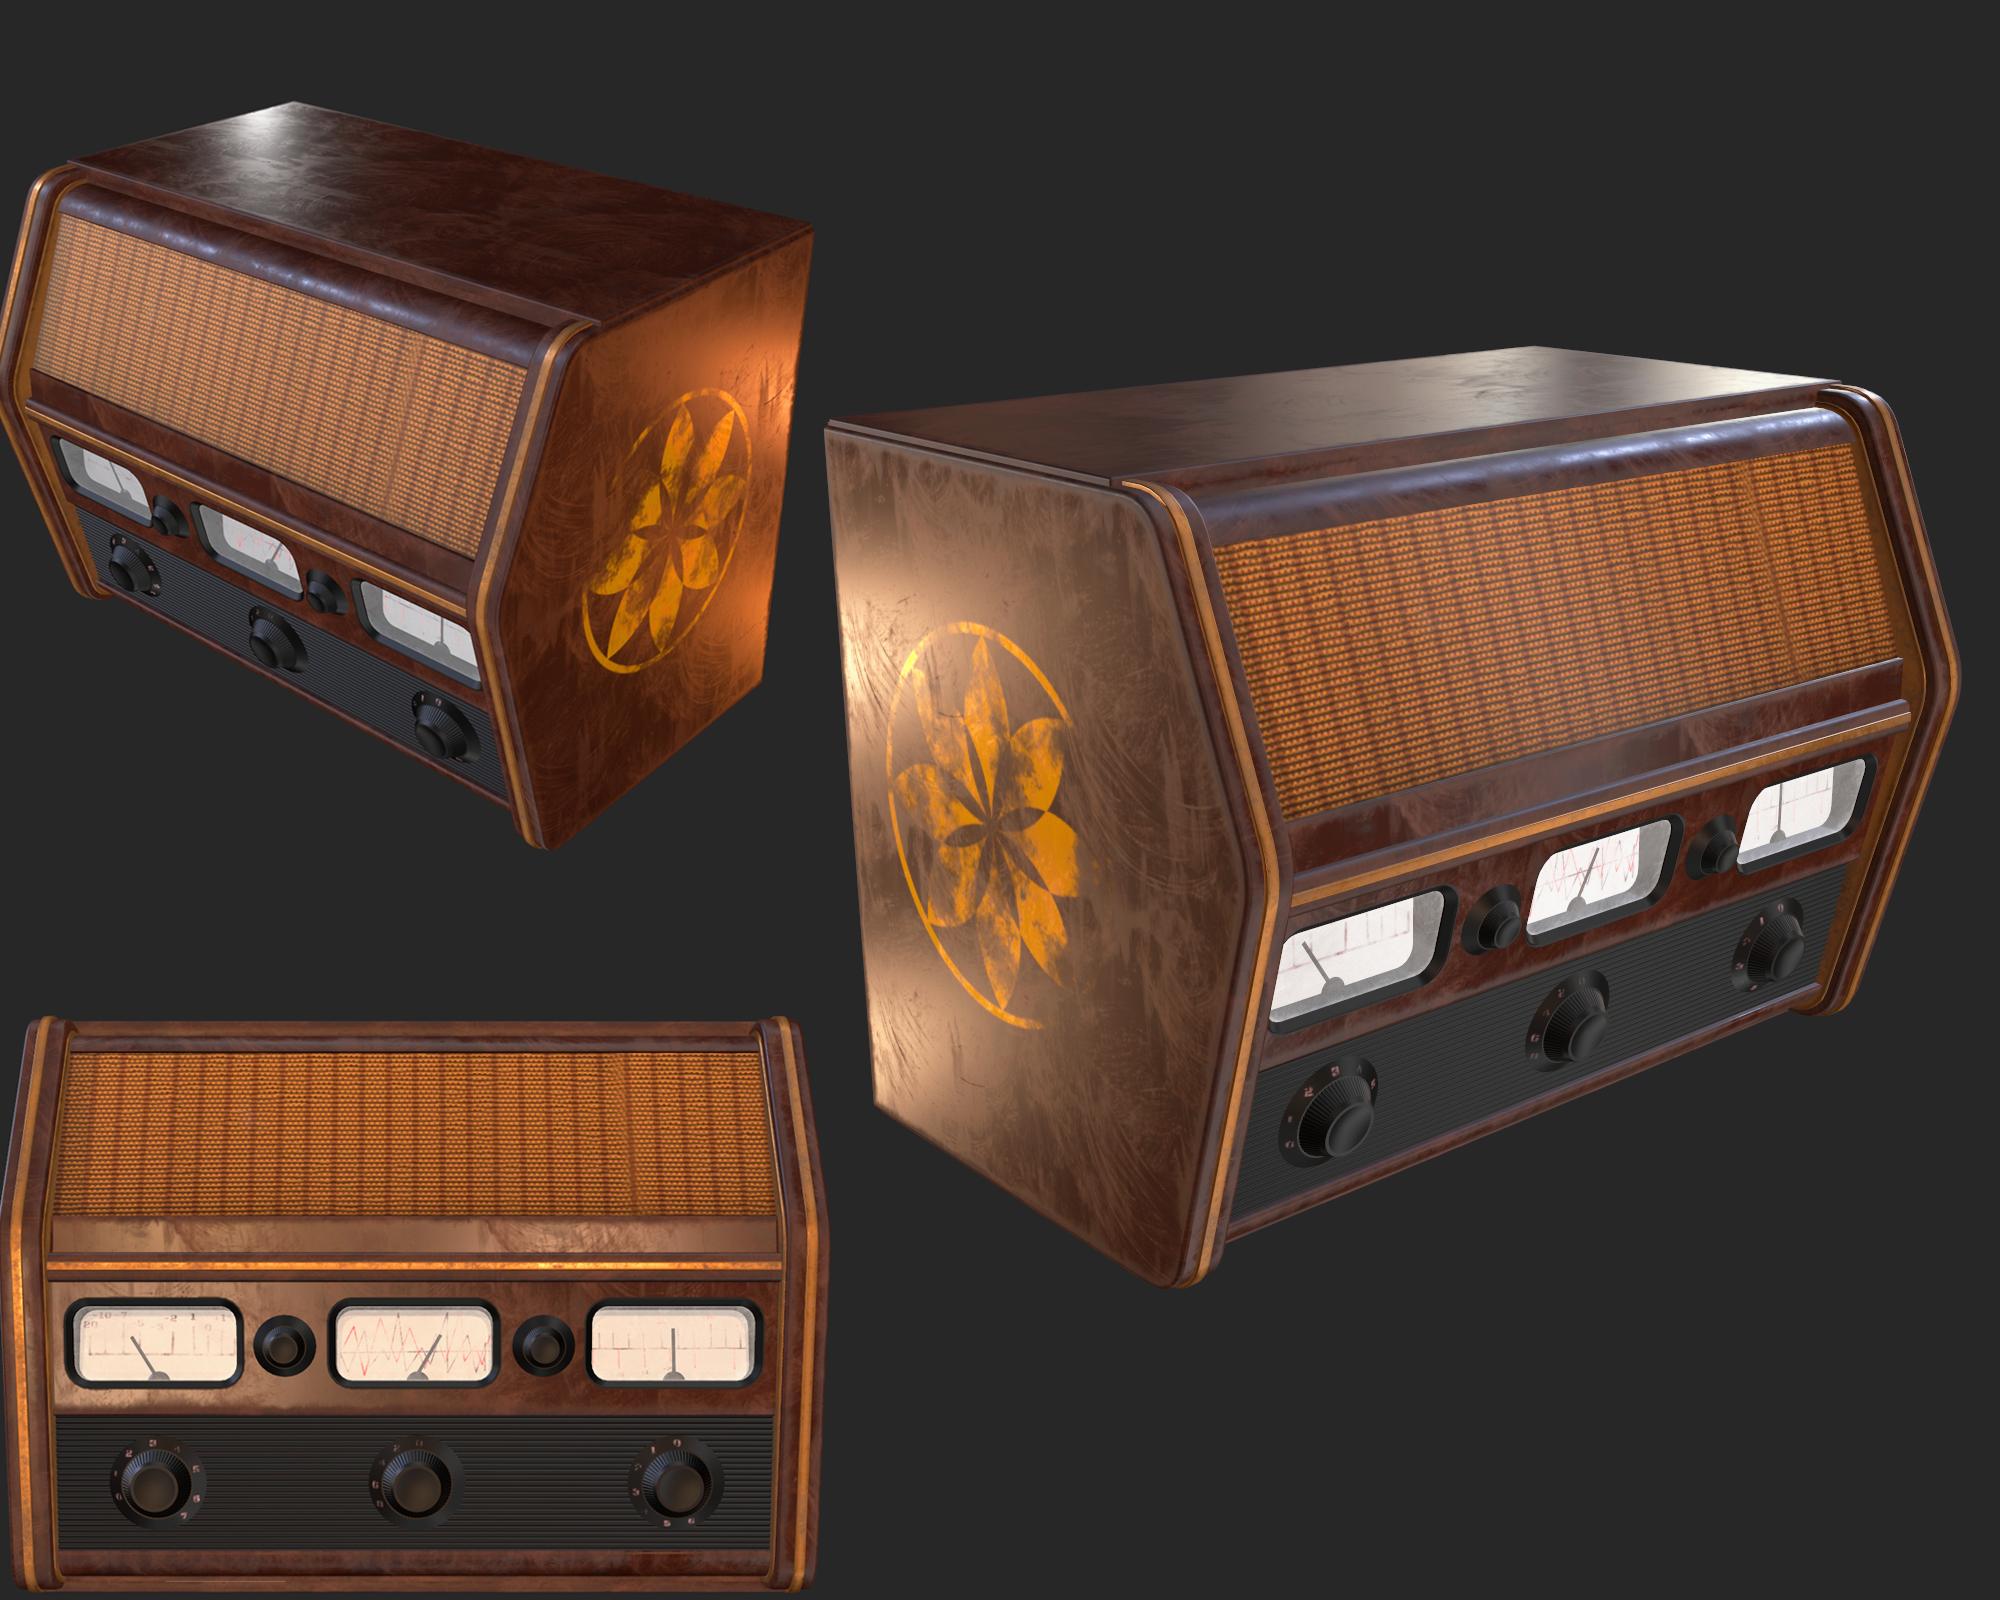 Old Antique Radio PBR